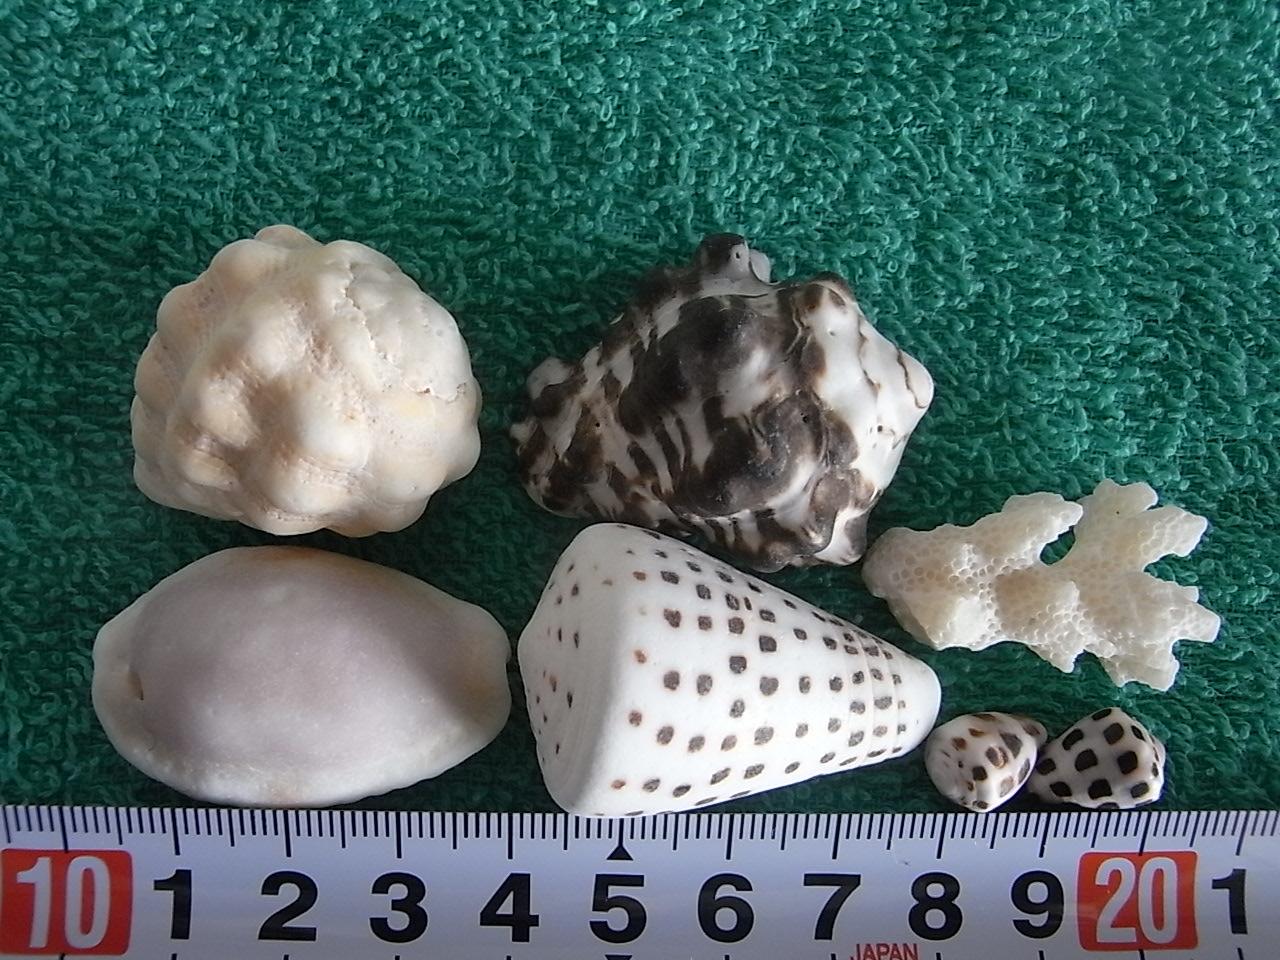 Lサイズ貝ガラ・珊瑚3.5~4.5cm